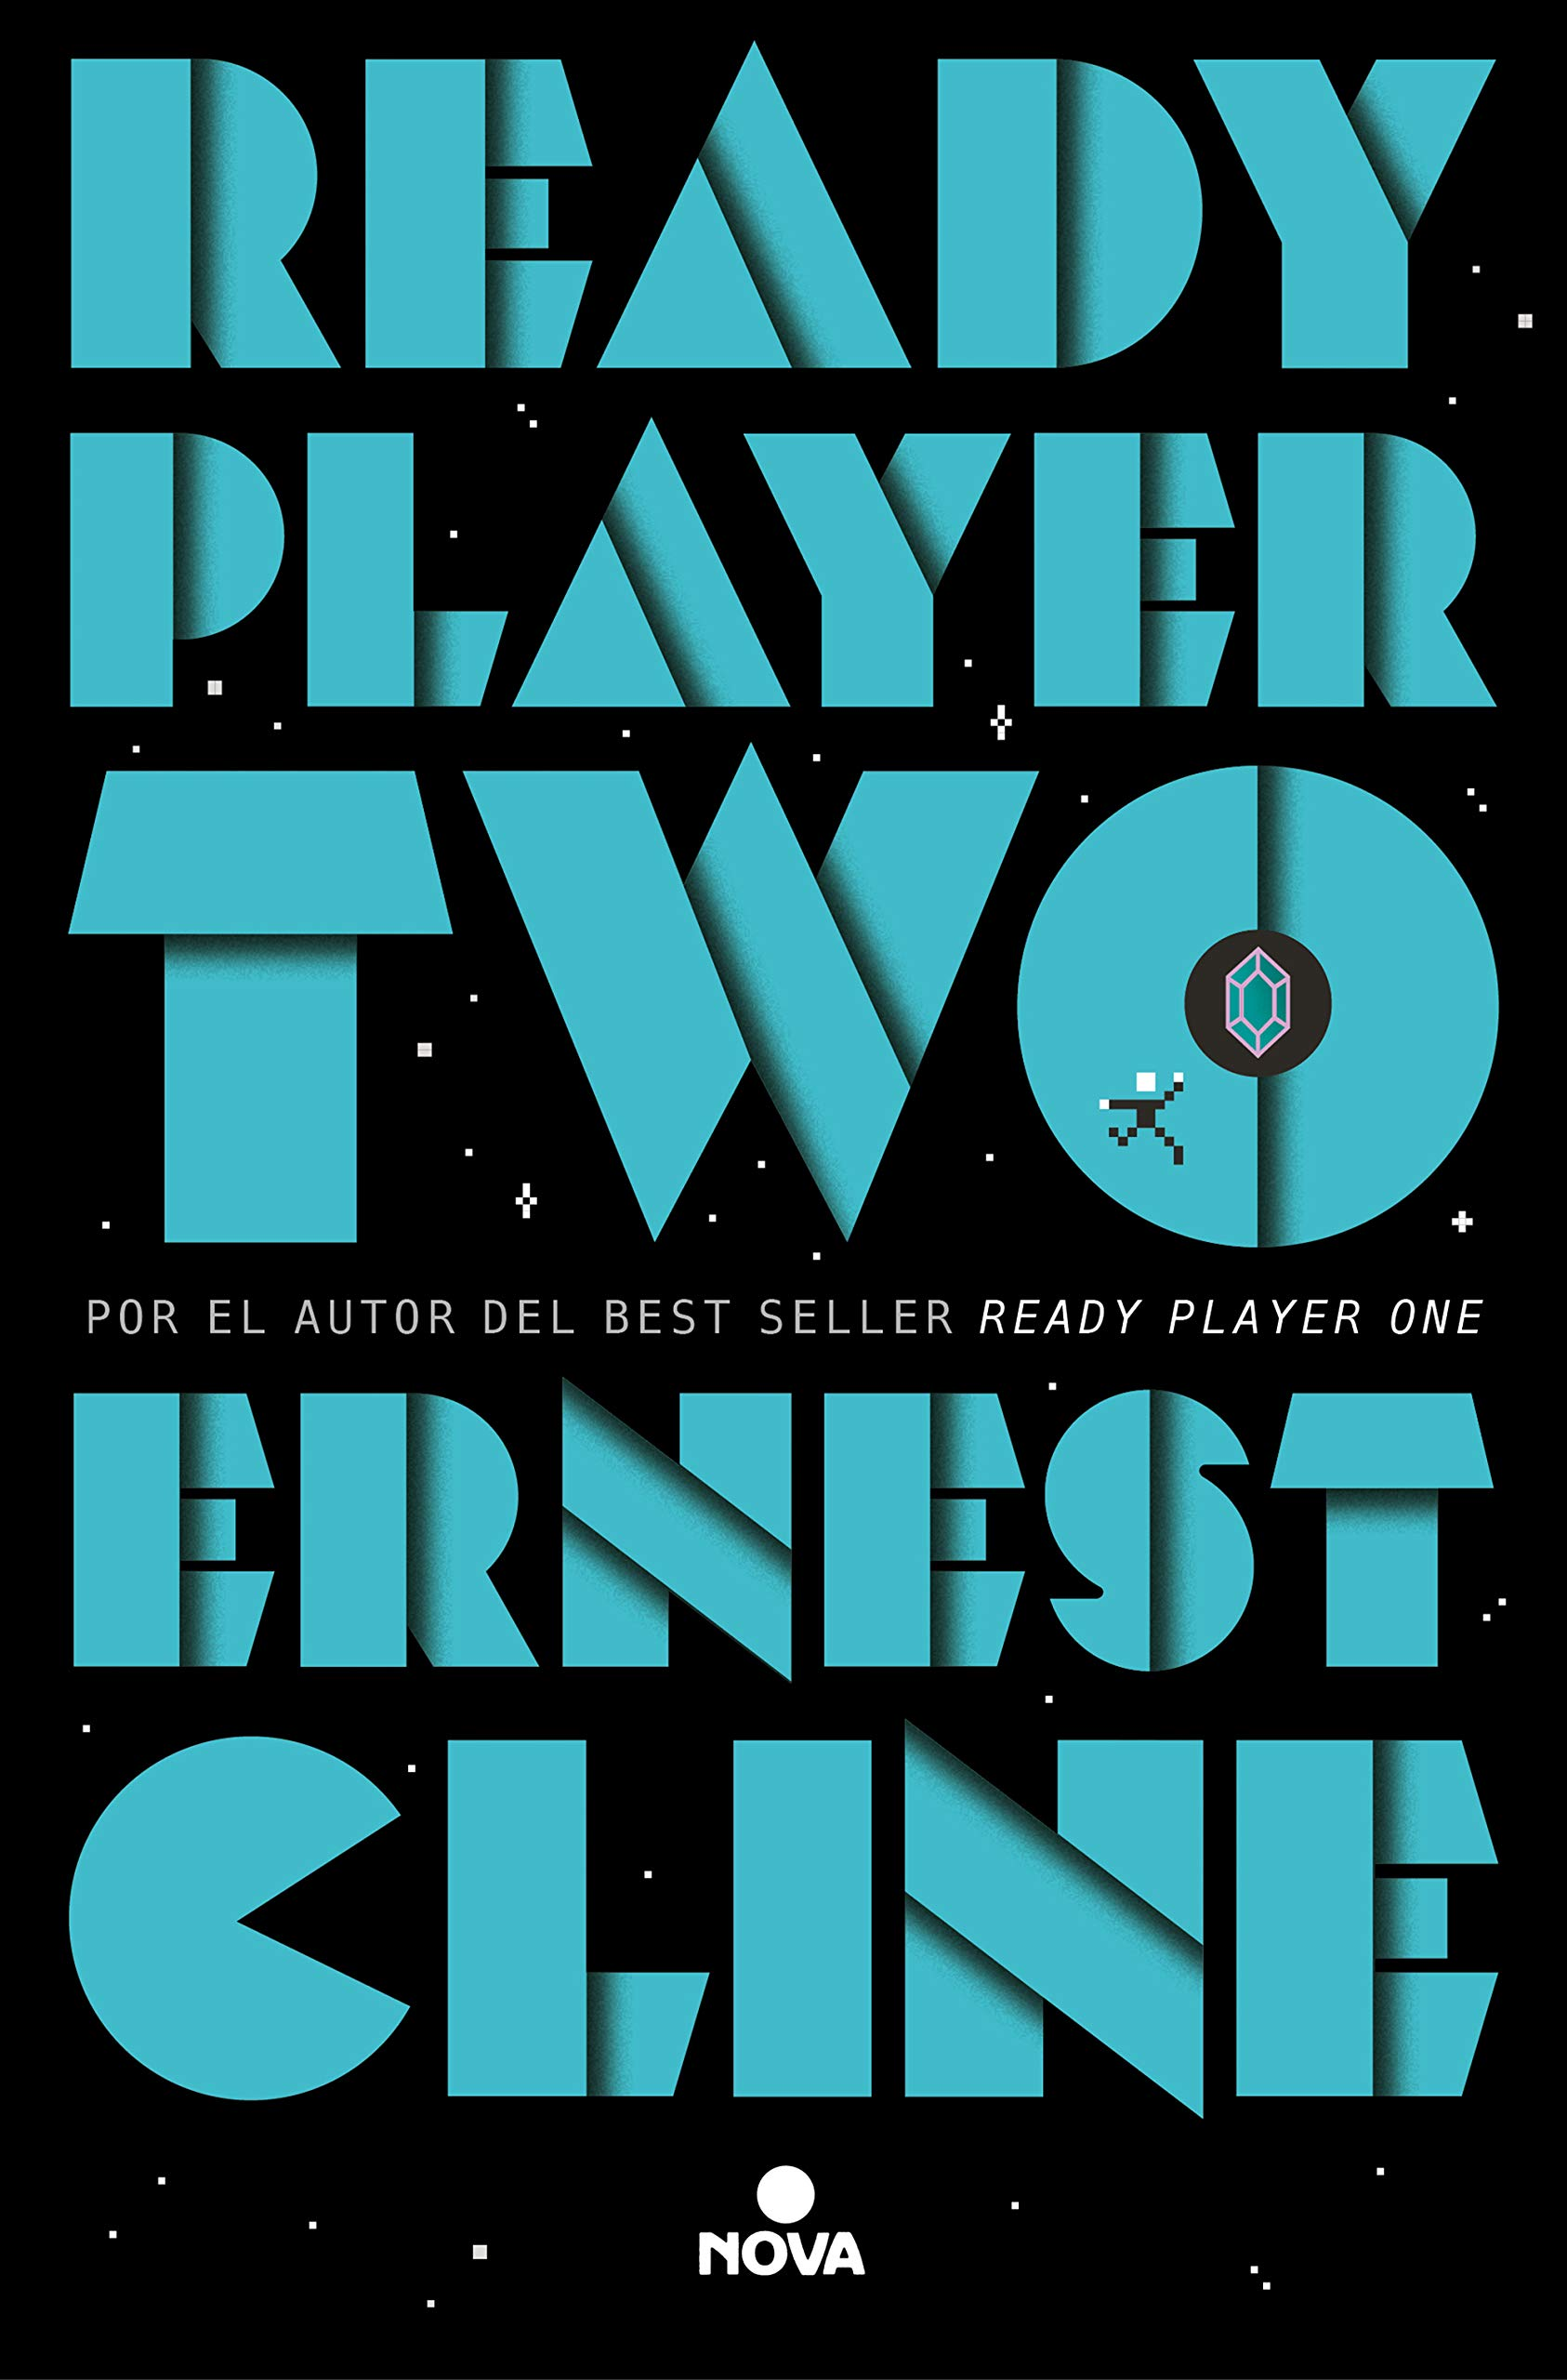 Ready Player Two by Antonio Torrubia Rodríguez, Ernest Cline